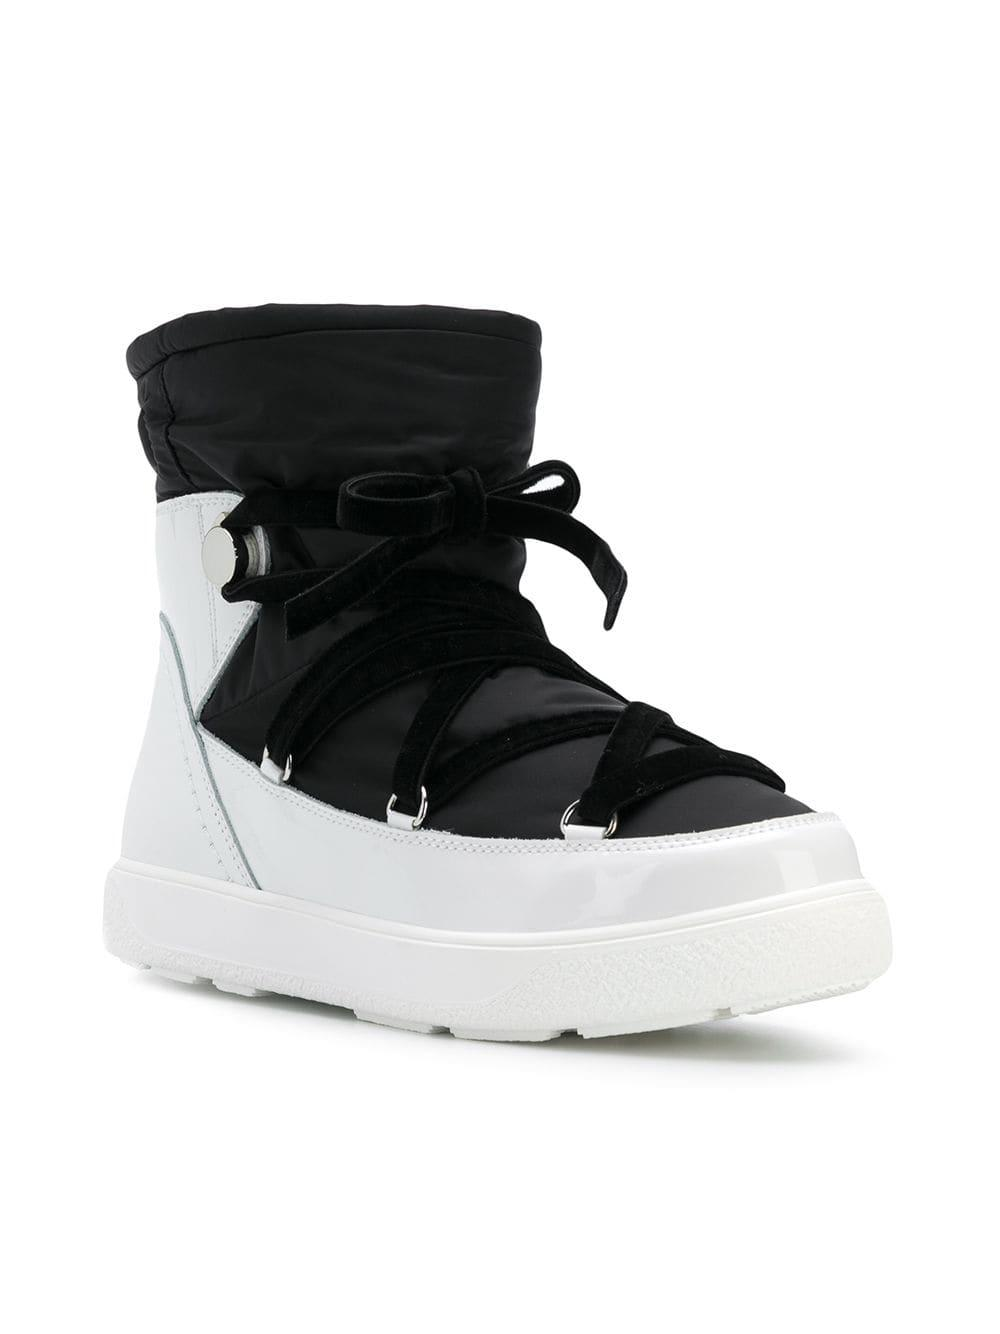 b8f2ddff87a0 Lyst - Moncler Platform Snow Boots in Black - Save 68.31168831168831%